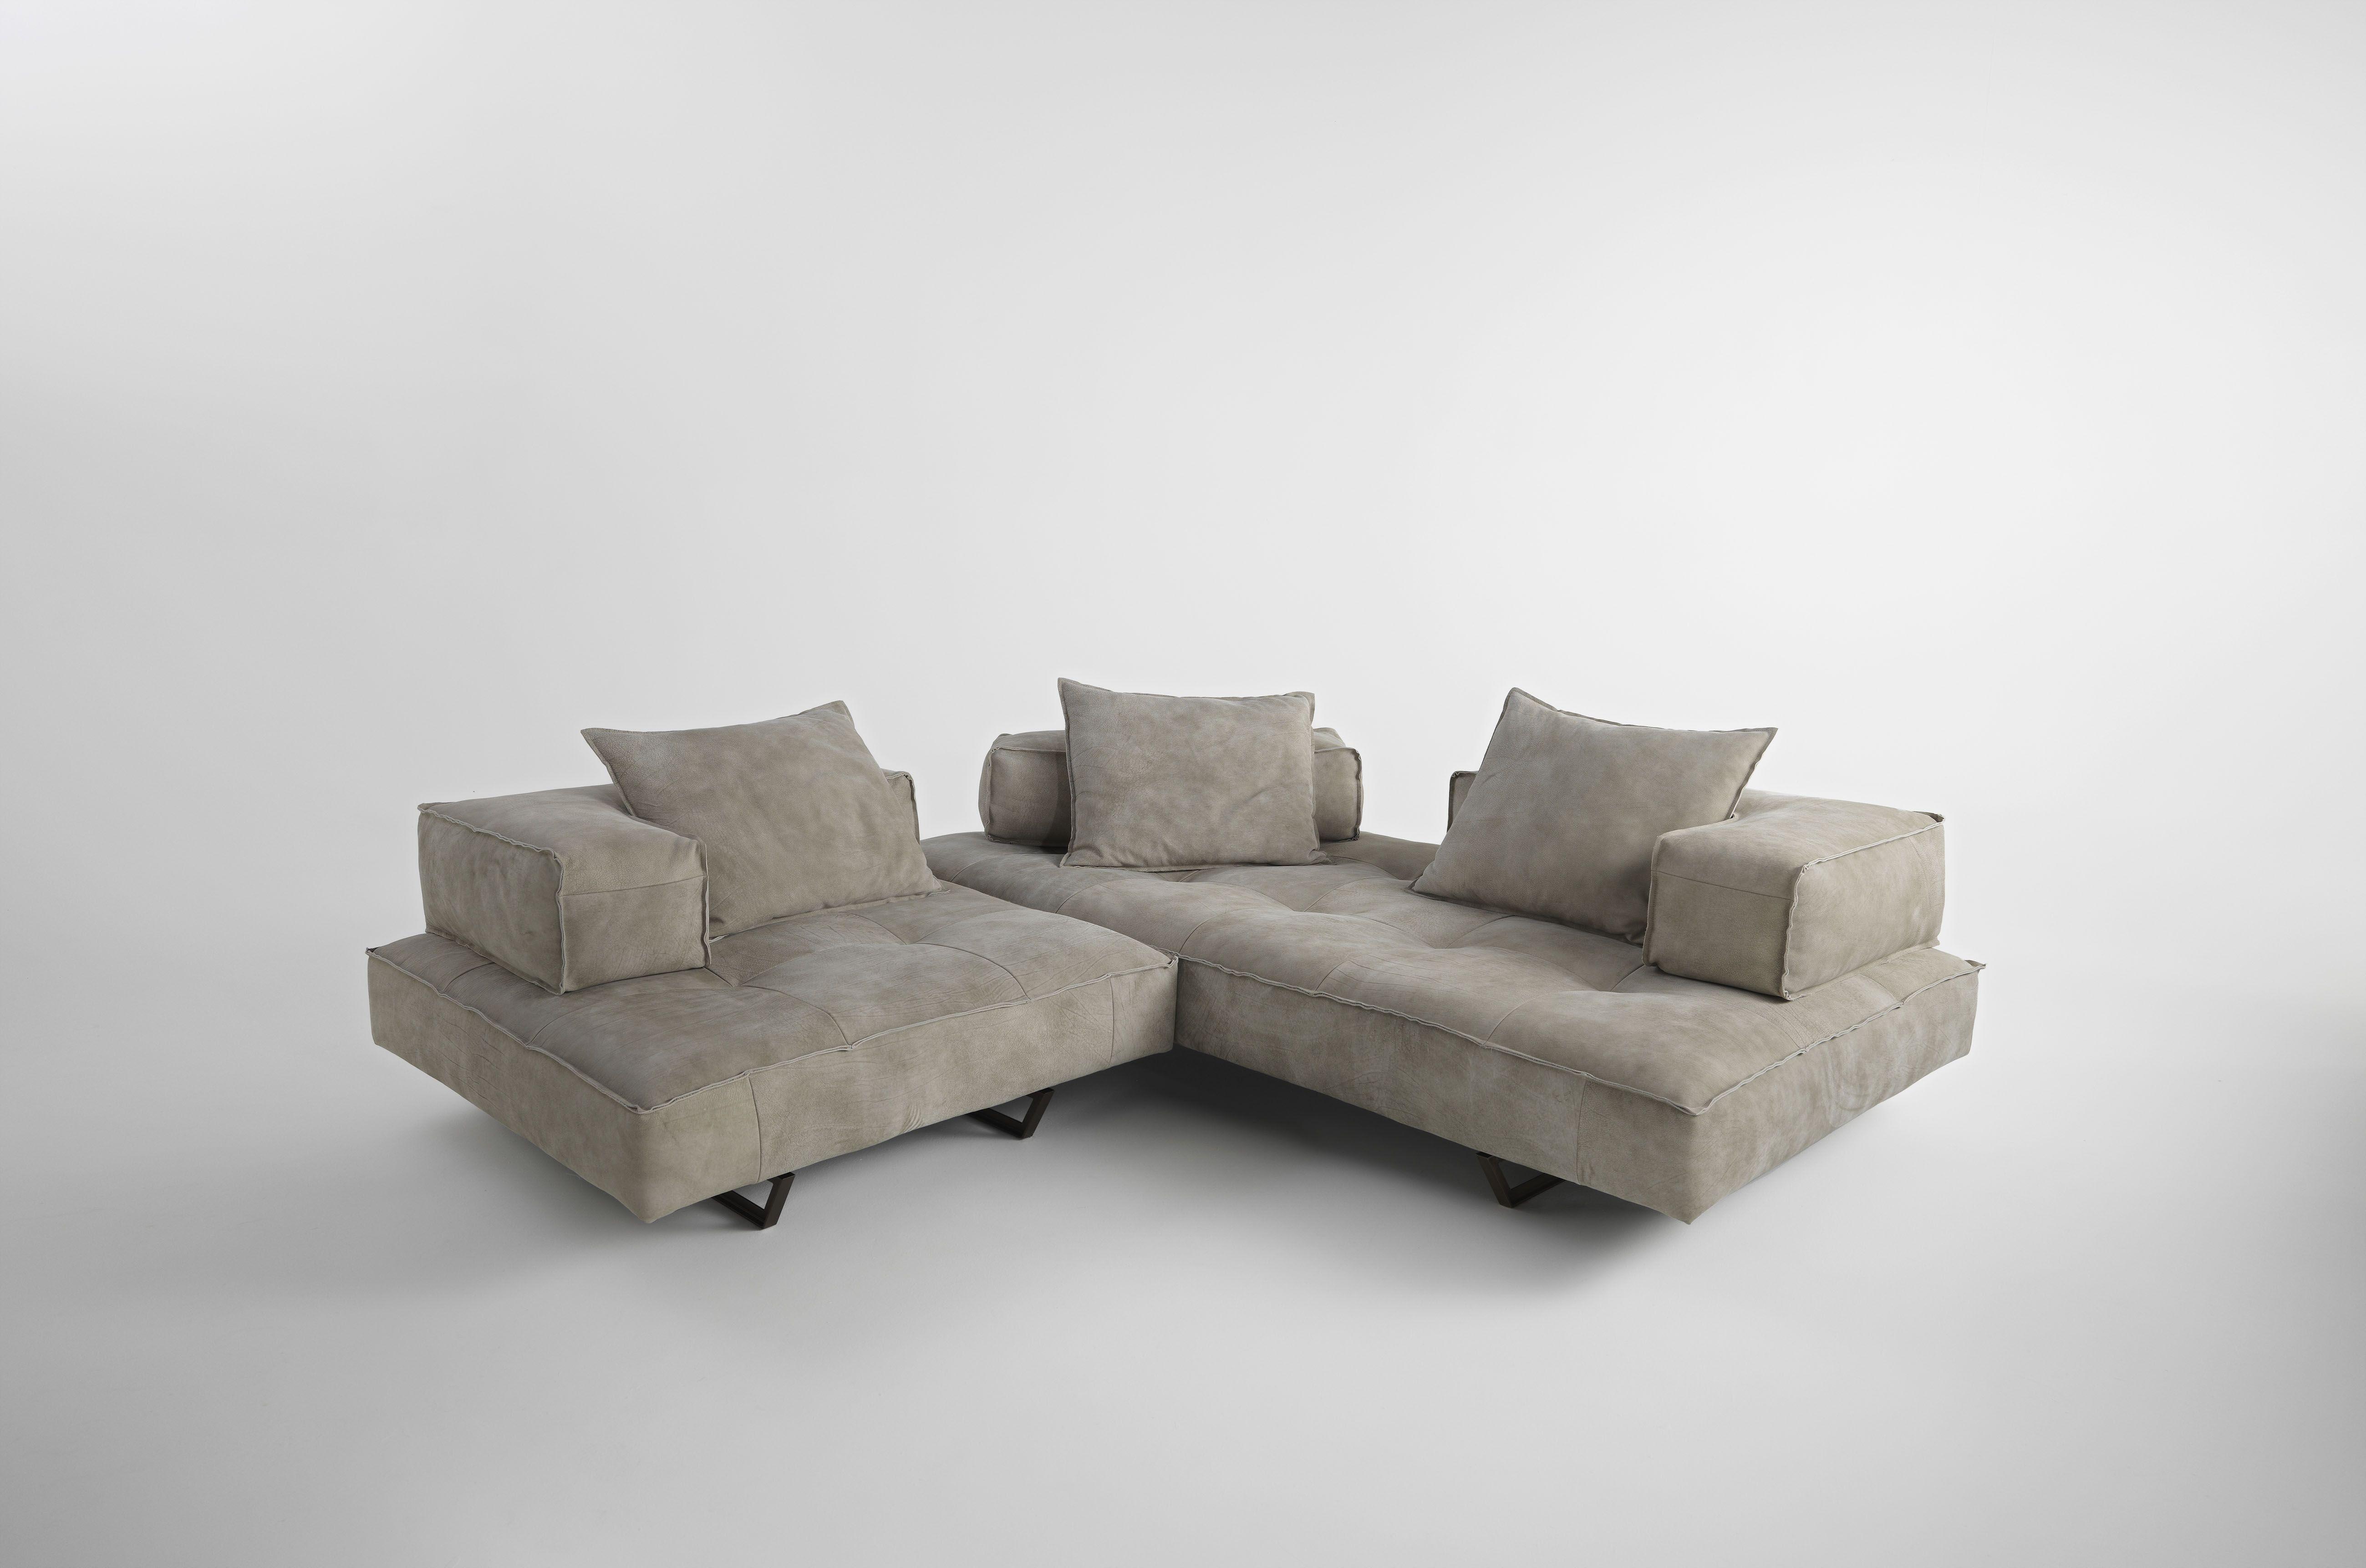 M1 Sofa Modular Sofa With Various Elements Matchable According To  # Muebles Sedutti